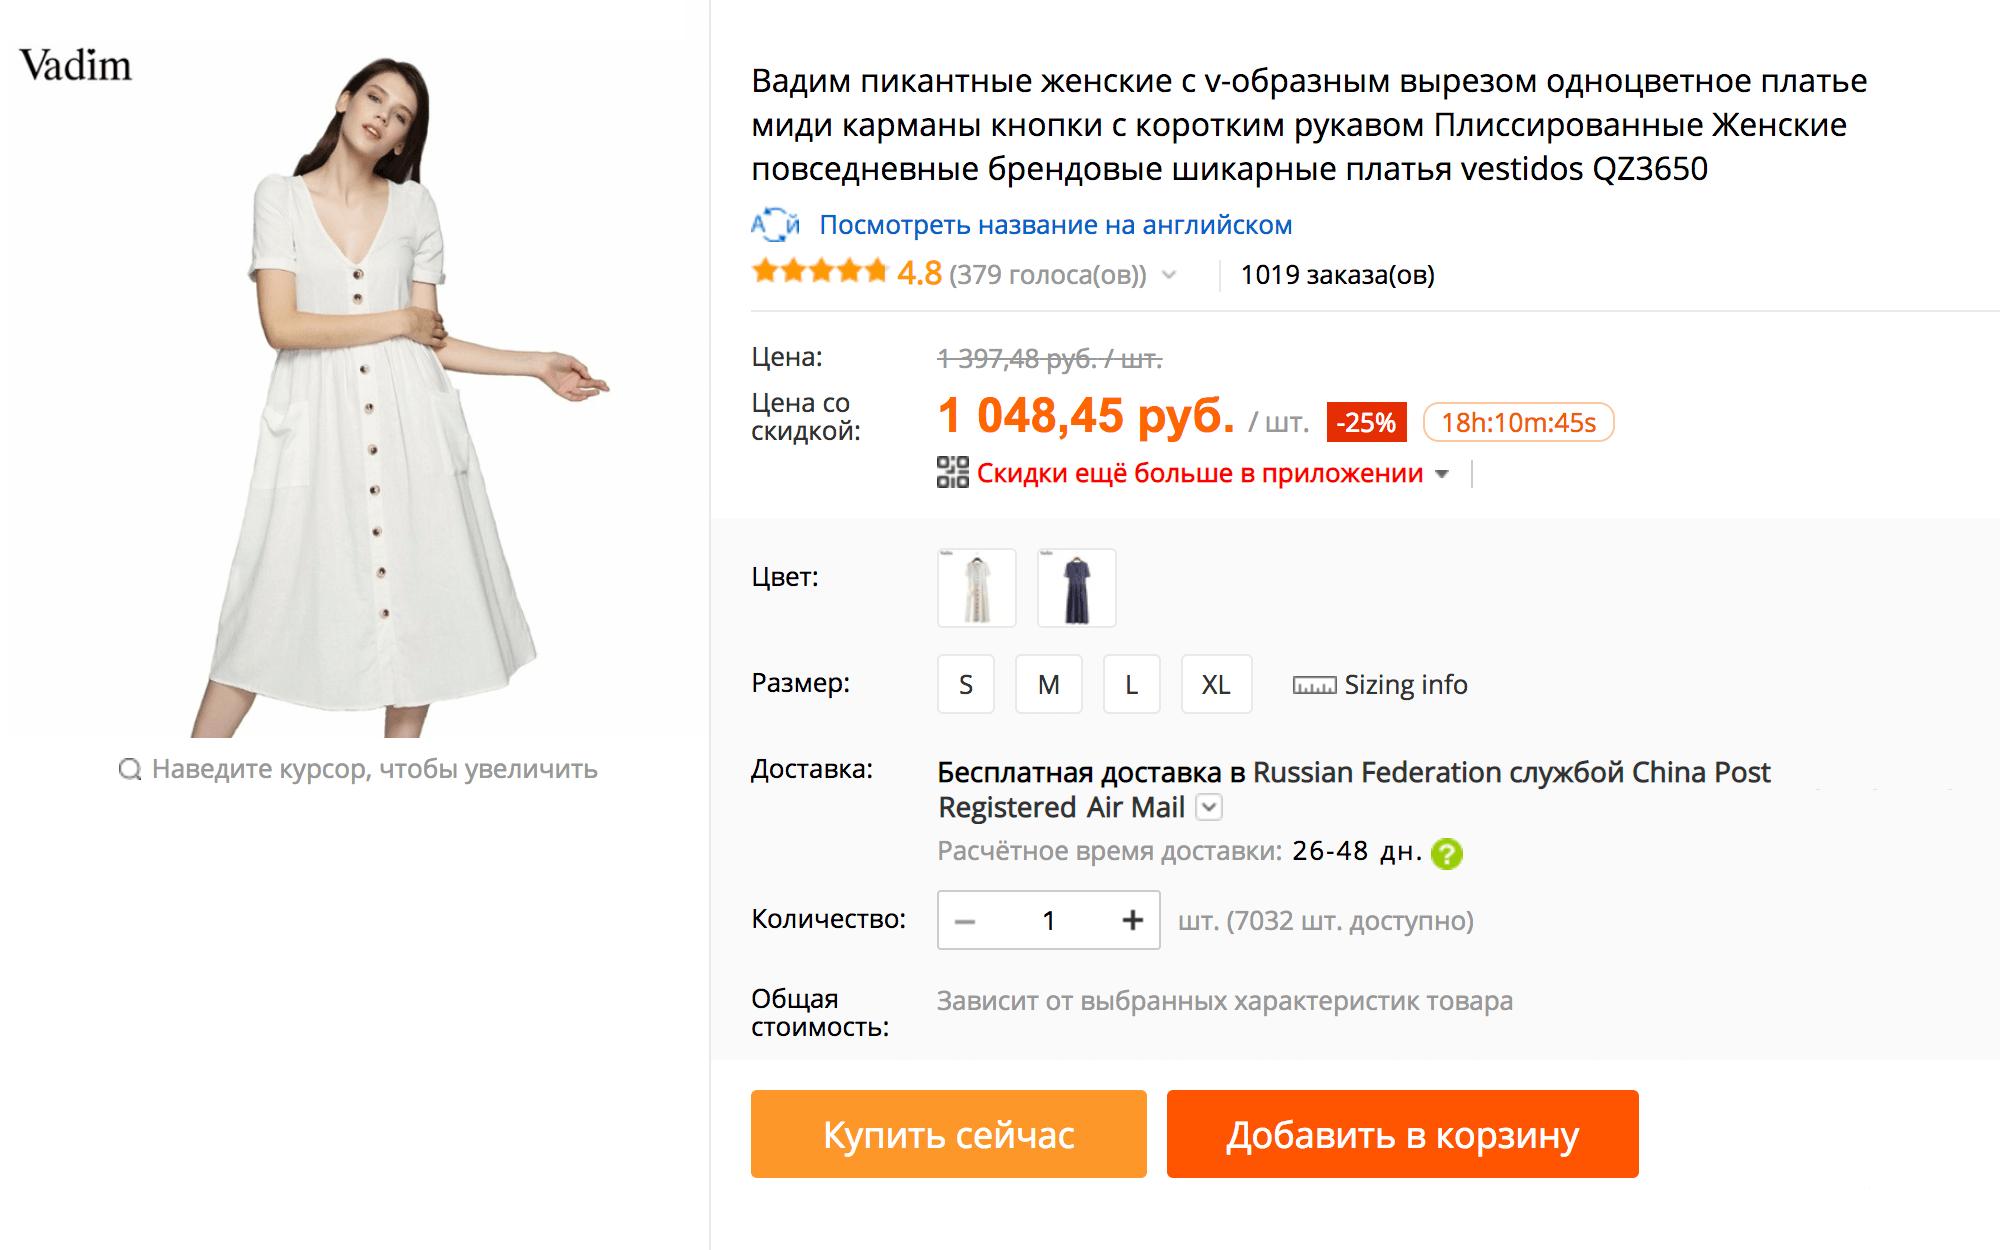 Аналогичное платье на «Алиэкспрессе» за 1048<span class=ruble>Р</span>